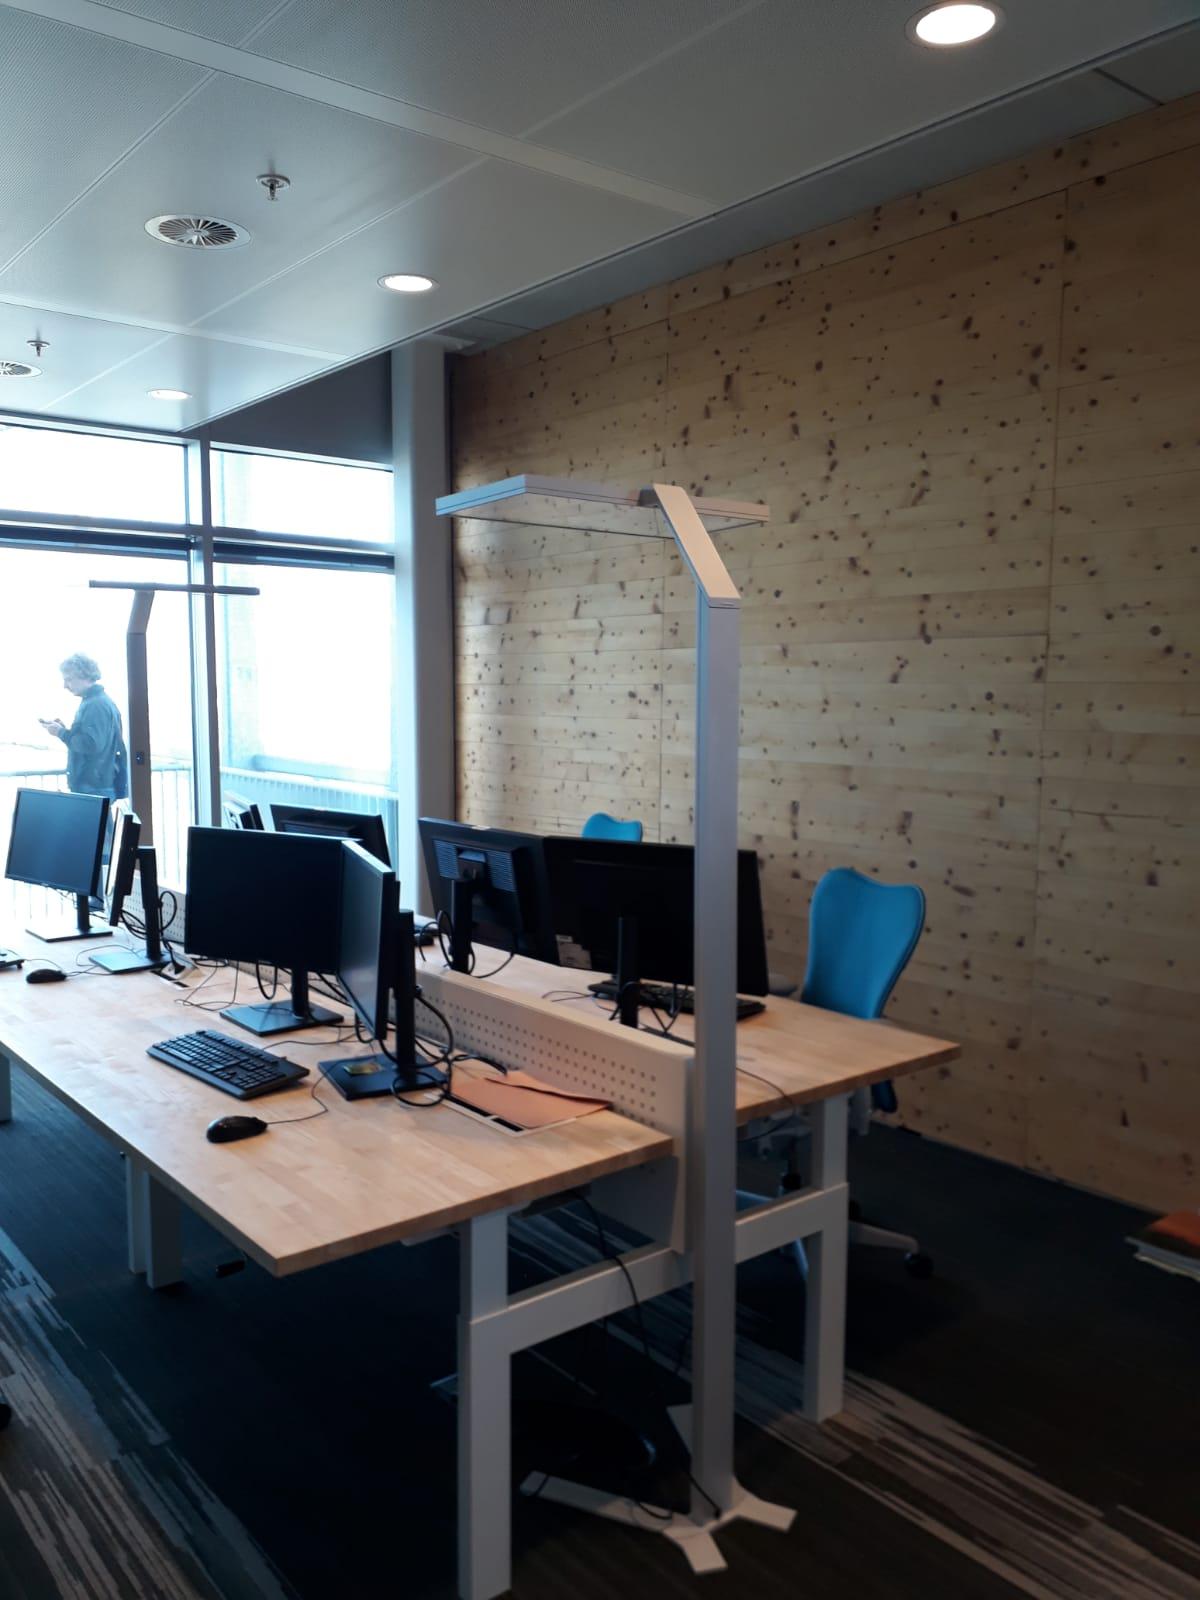 architektinnen initiative Exkursion Venlo Arbeitsplatz